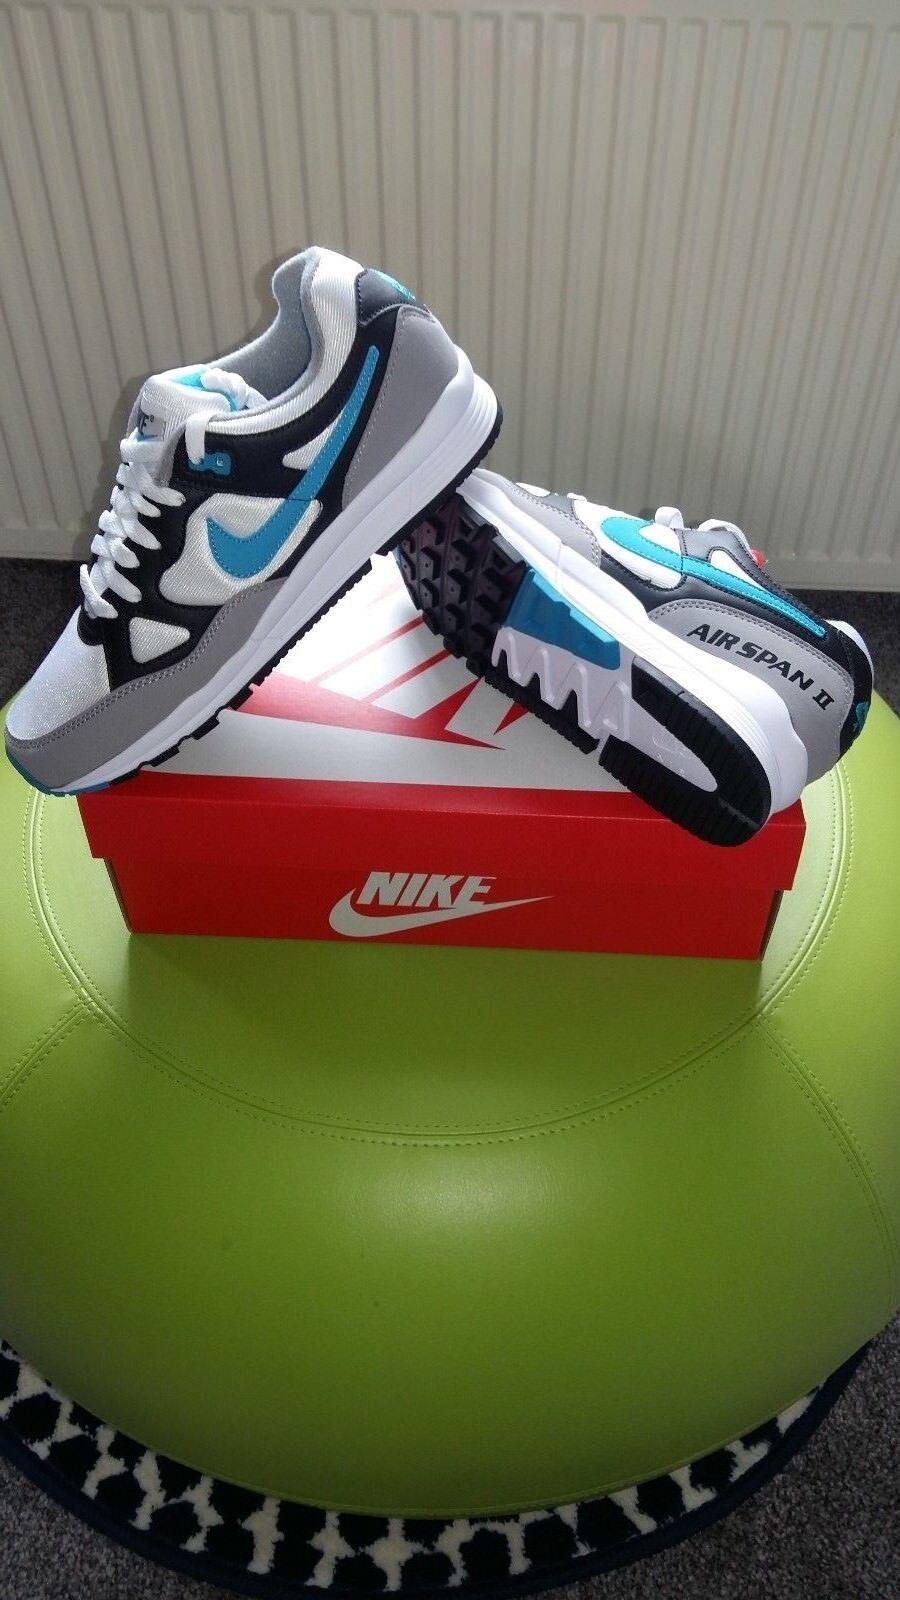 Nike Air Span 2 2 2 ... Retro unisex sports trainers Größe 8 uk  eur-42.5 27aba6